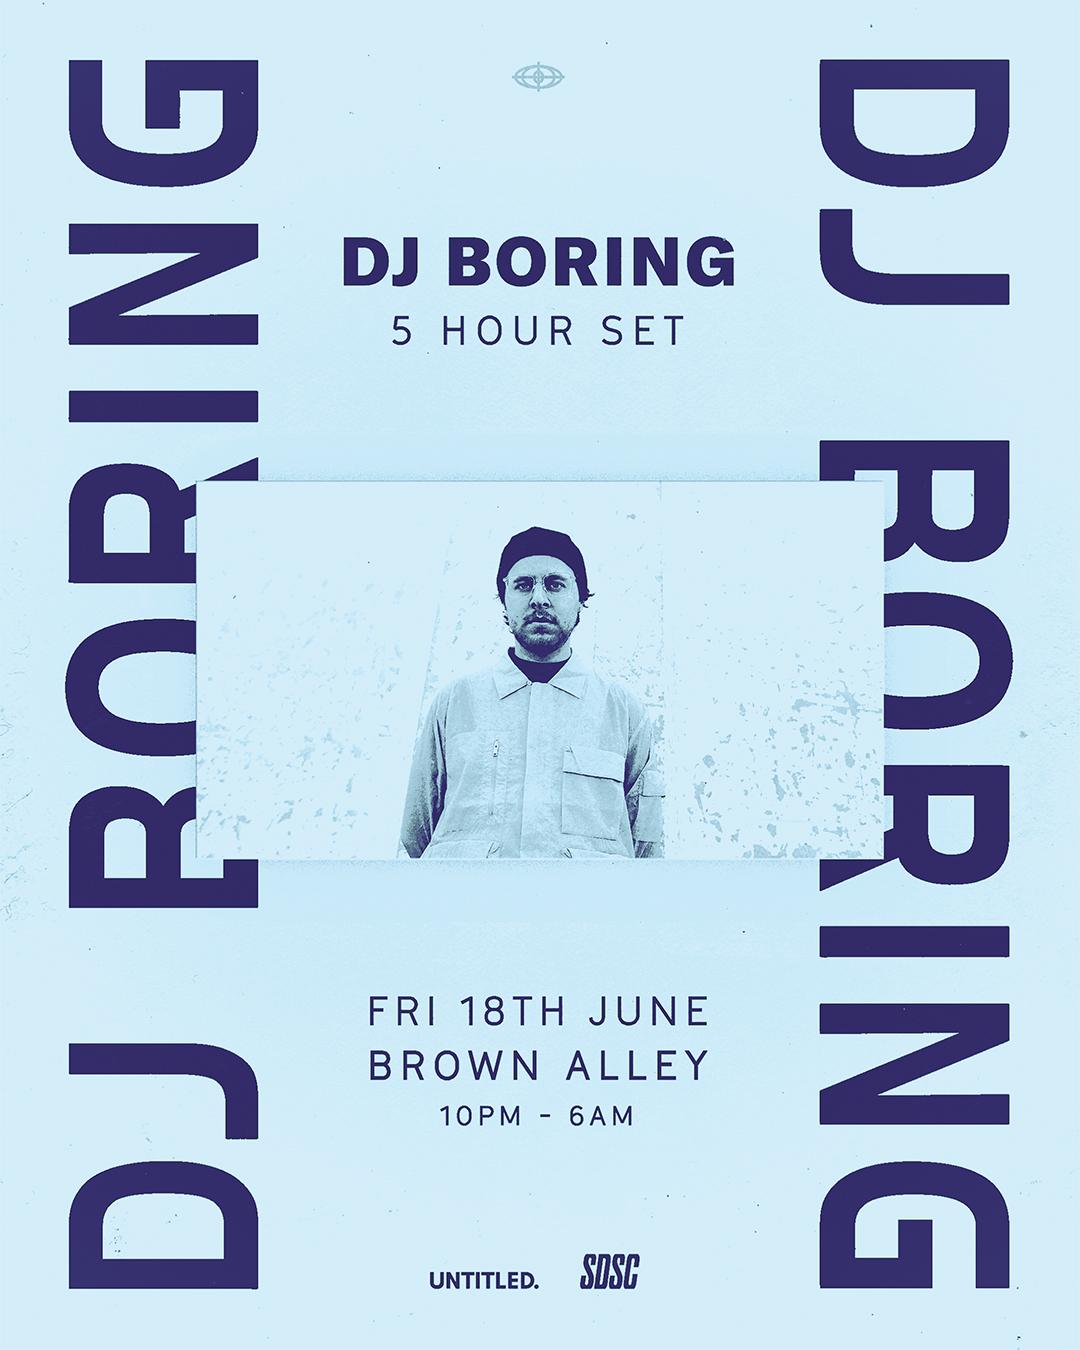 DJ BORING — 5 HOUR SET